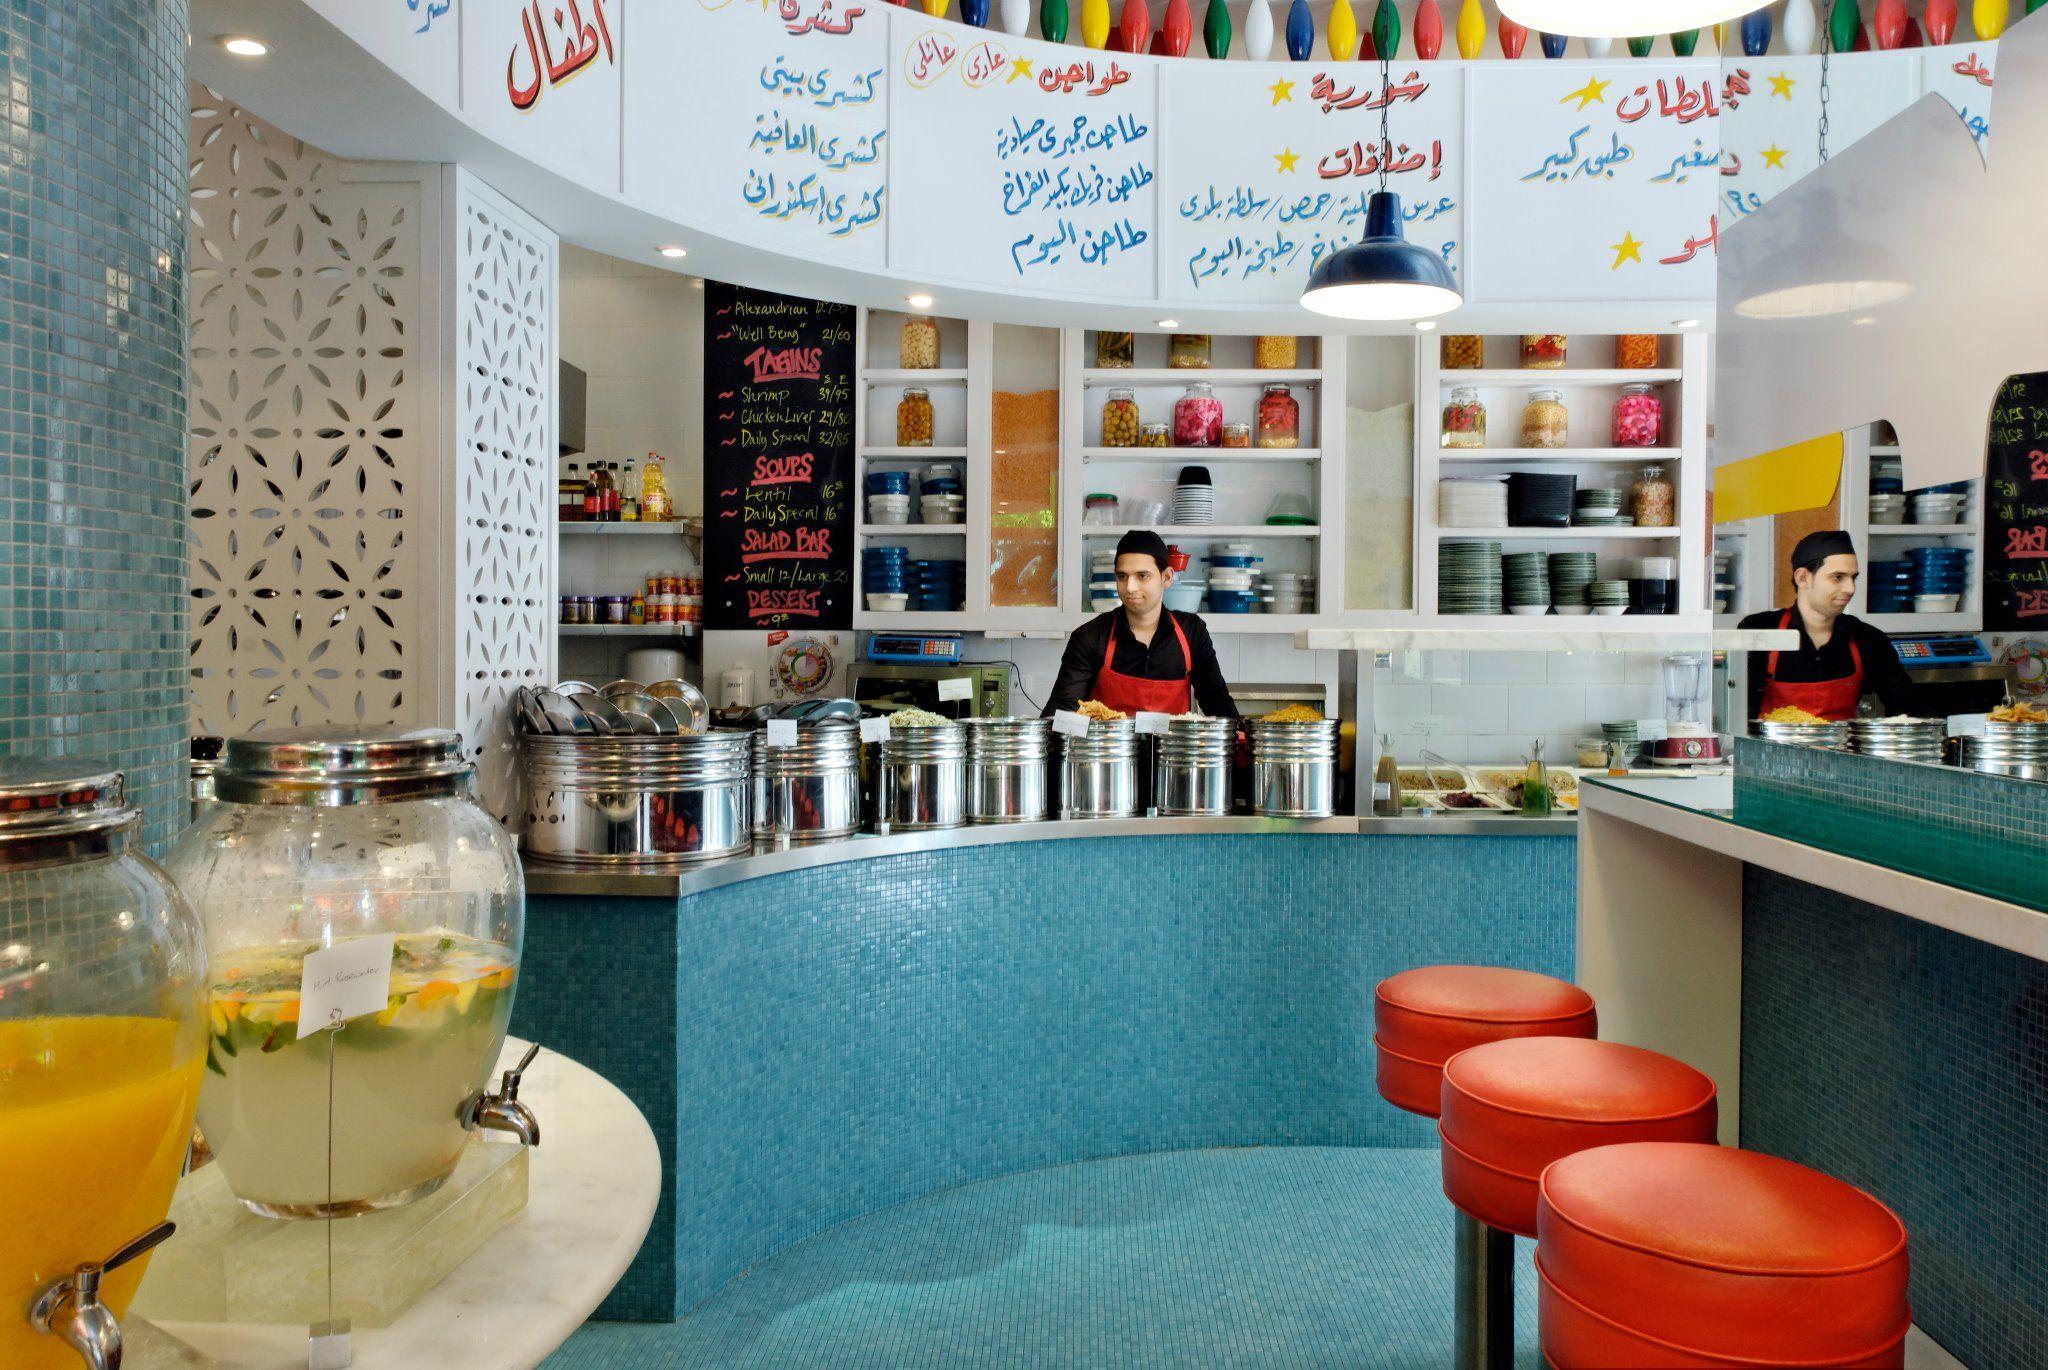 Cairo kitchen restaurant | Interior Design | Pinterest | Cairo ...